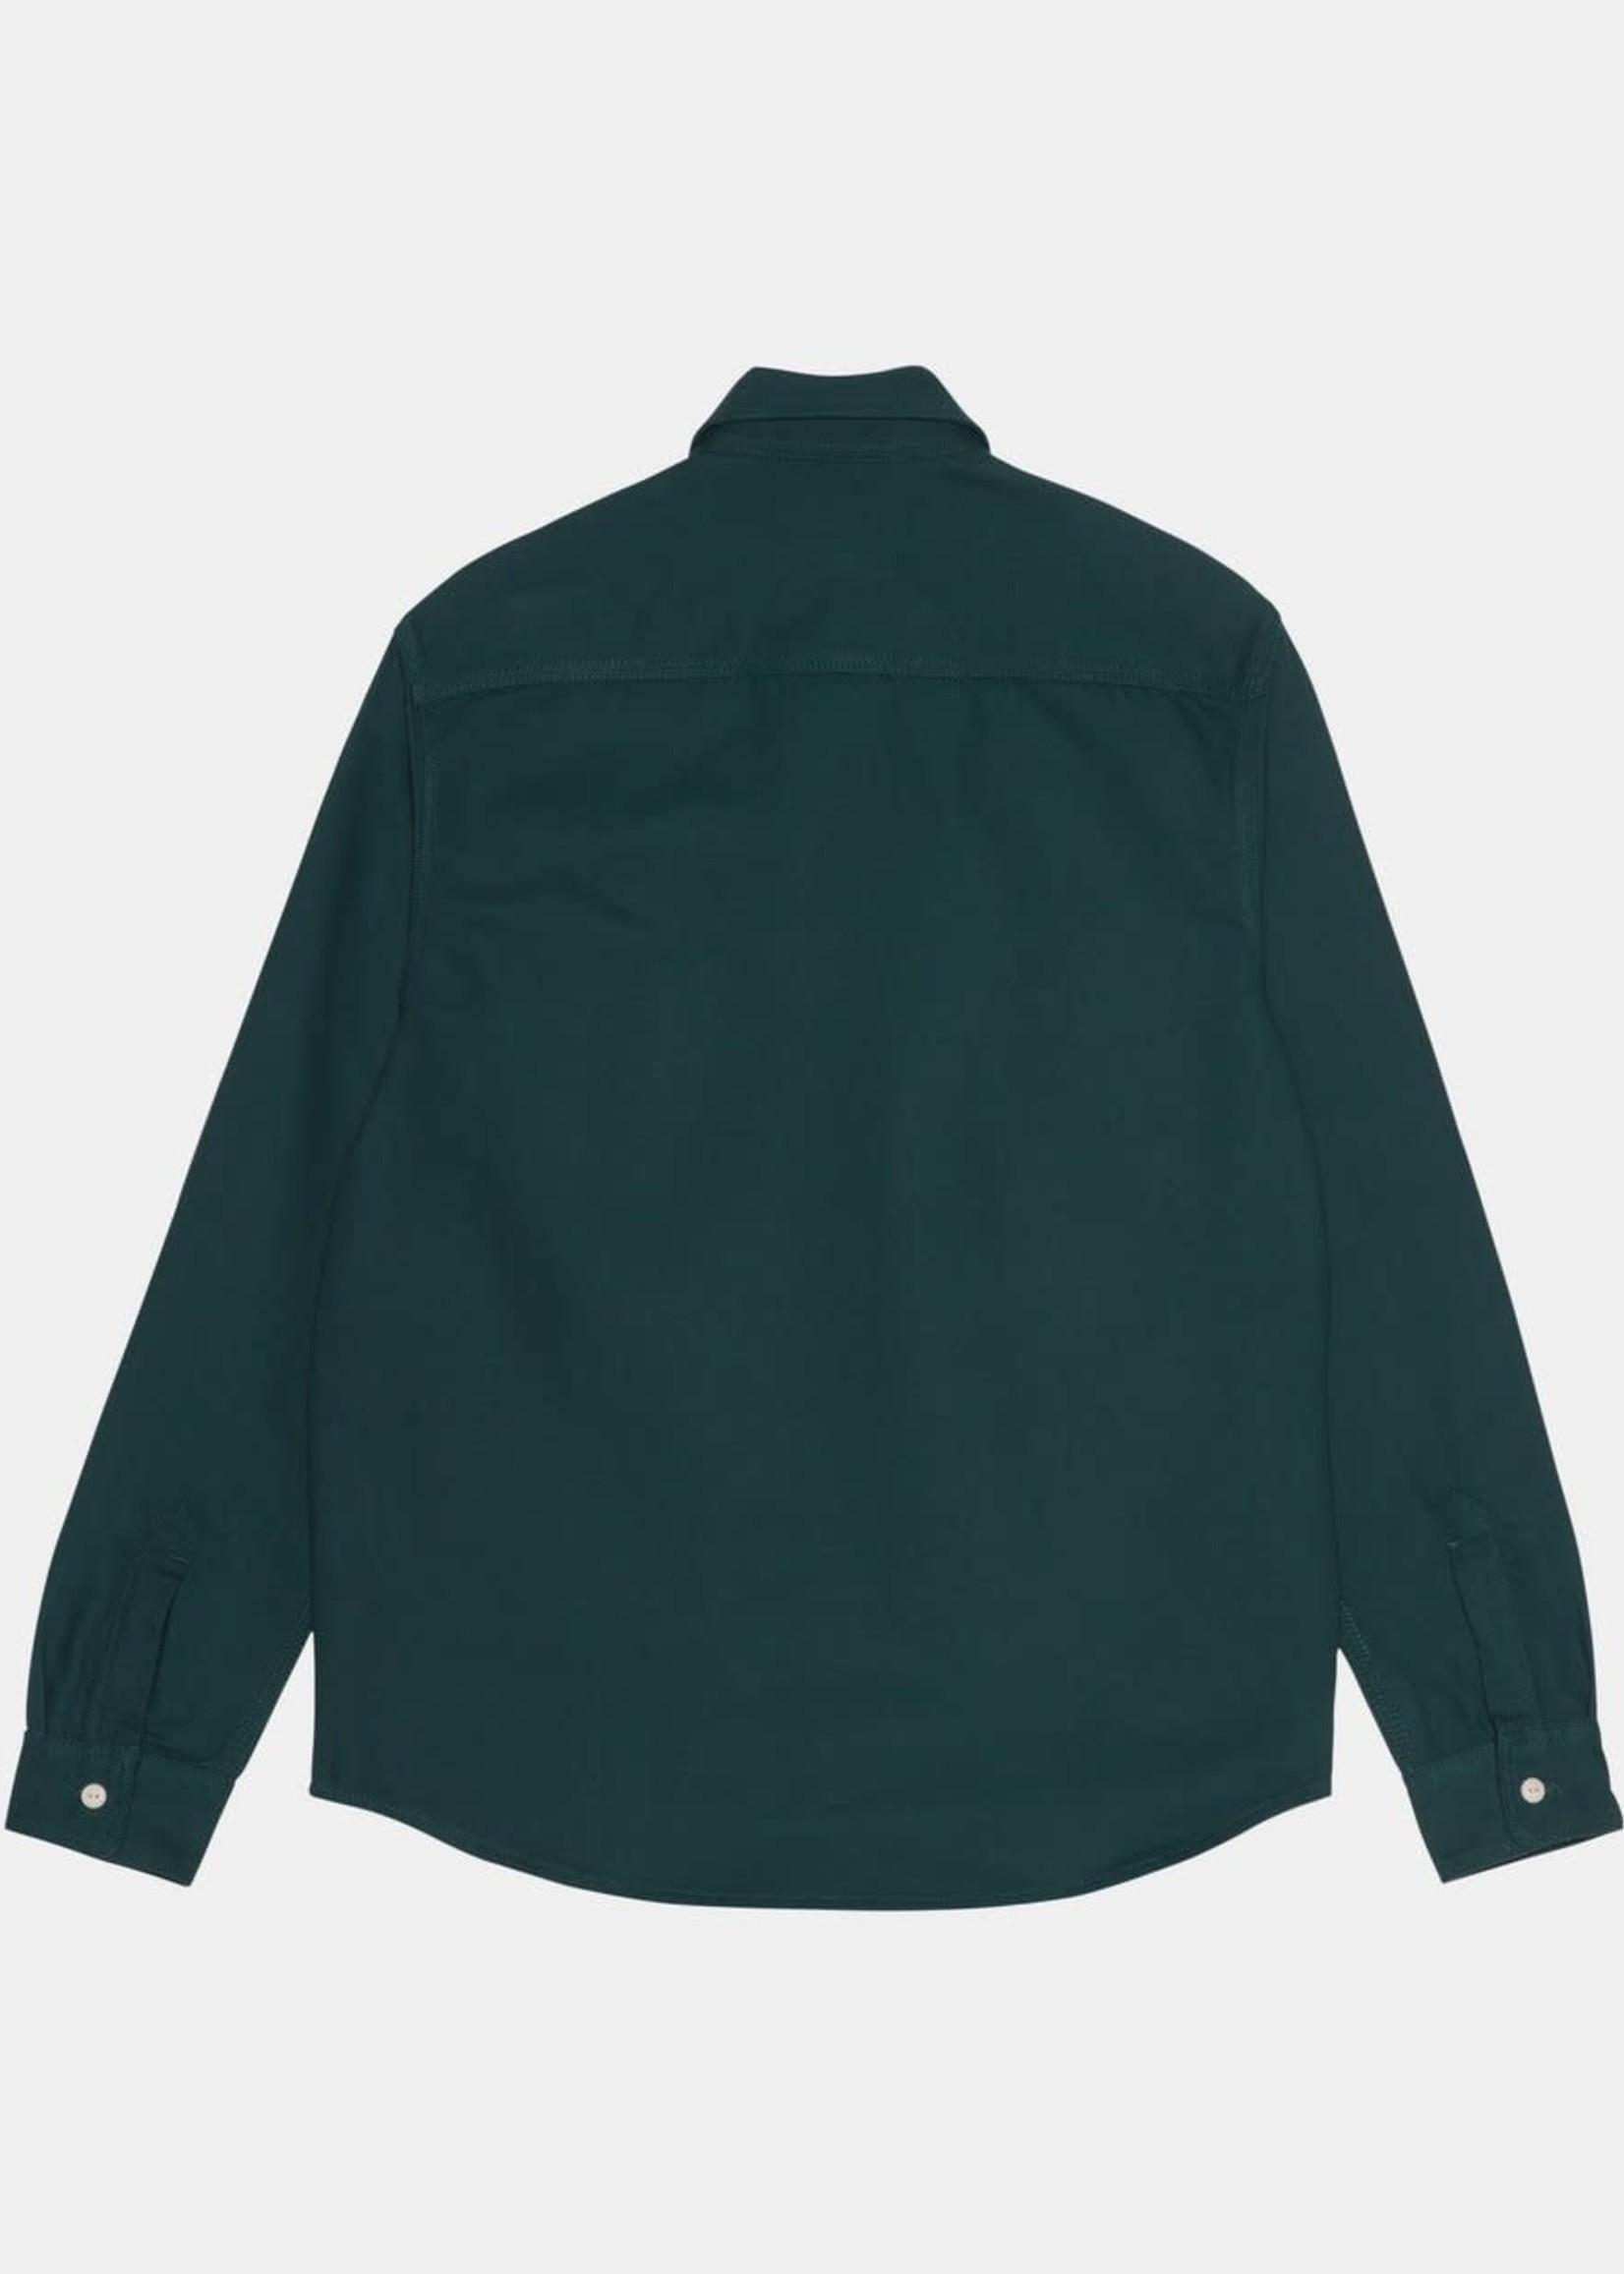 Carhartt Work In Progress Tony Shirt in Frasier Green